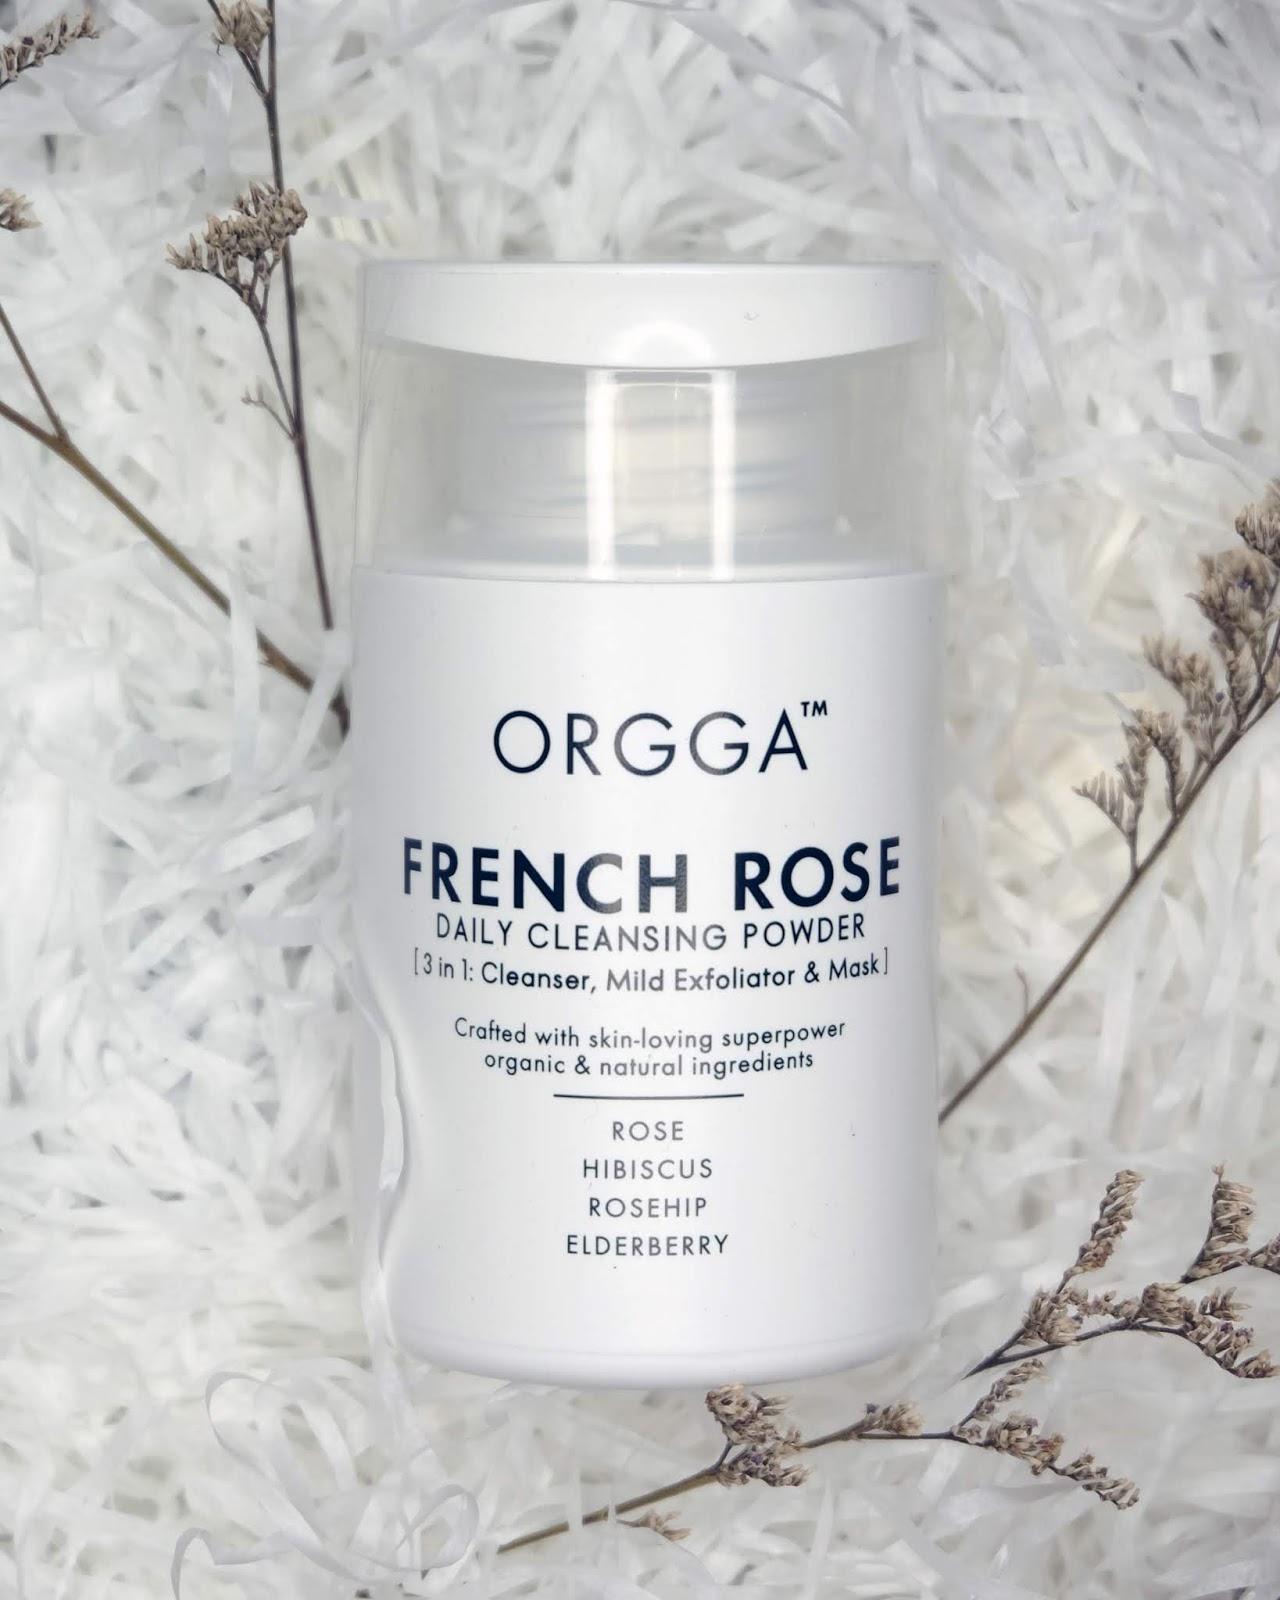 French Rose Daily Cleansing Powder Orgga Curitan Aqalili